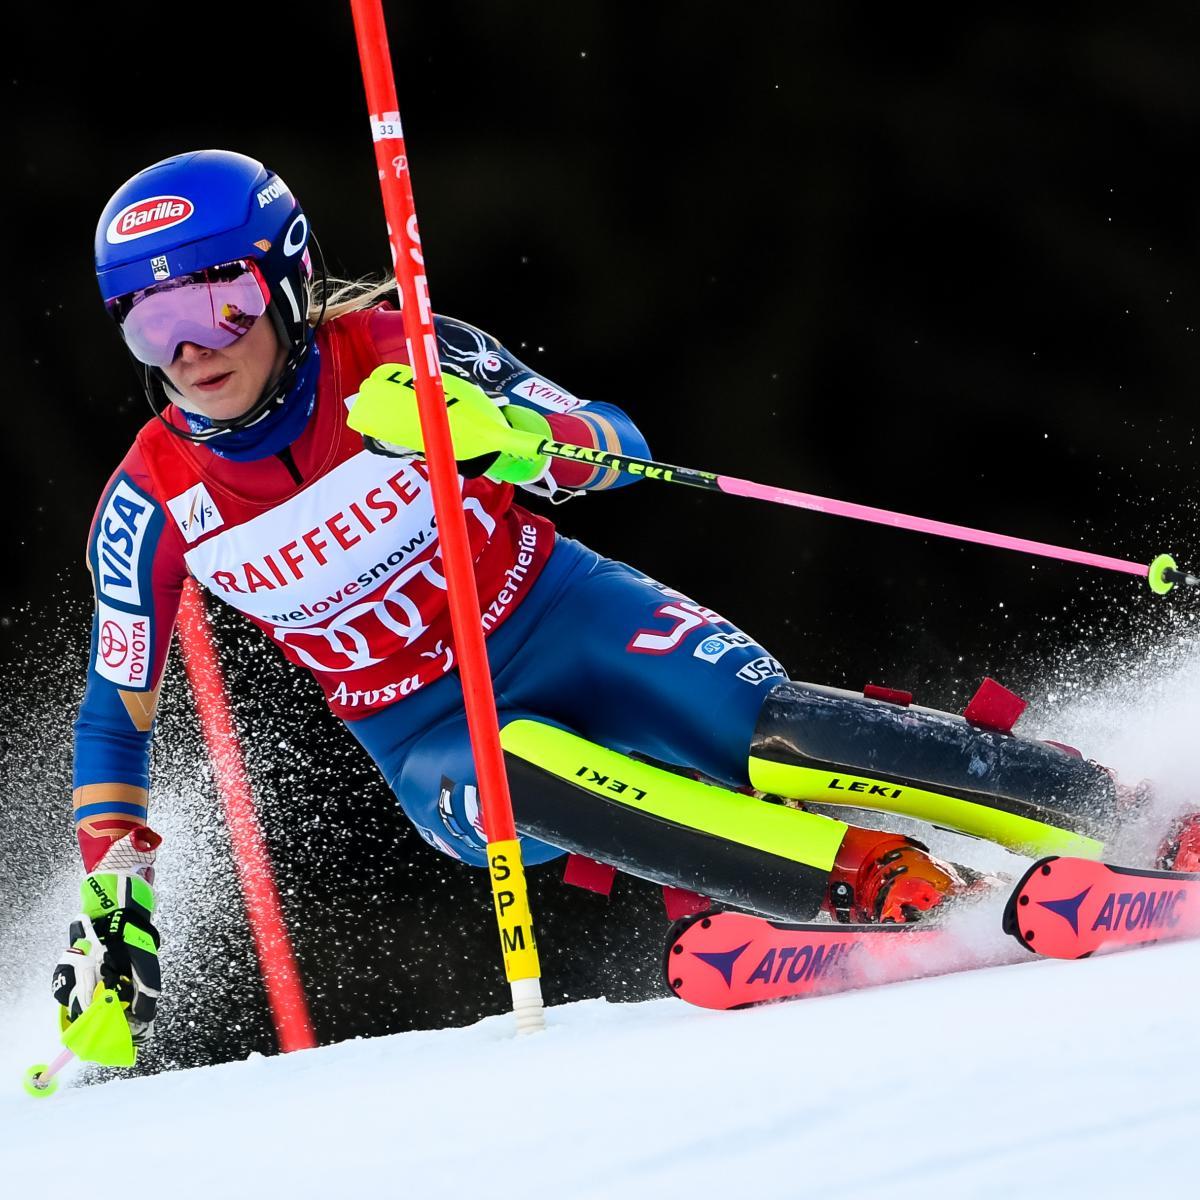 Olympic Alpine Skiing Schedule 2018: Women's Giant Slalom